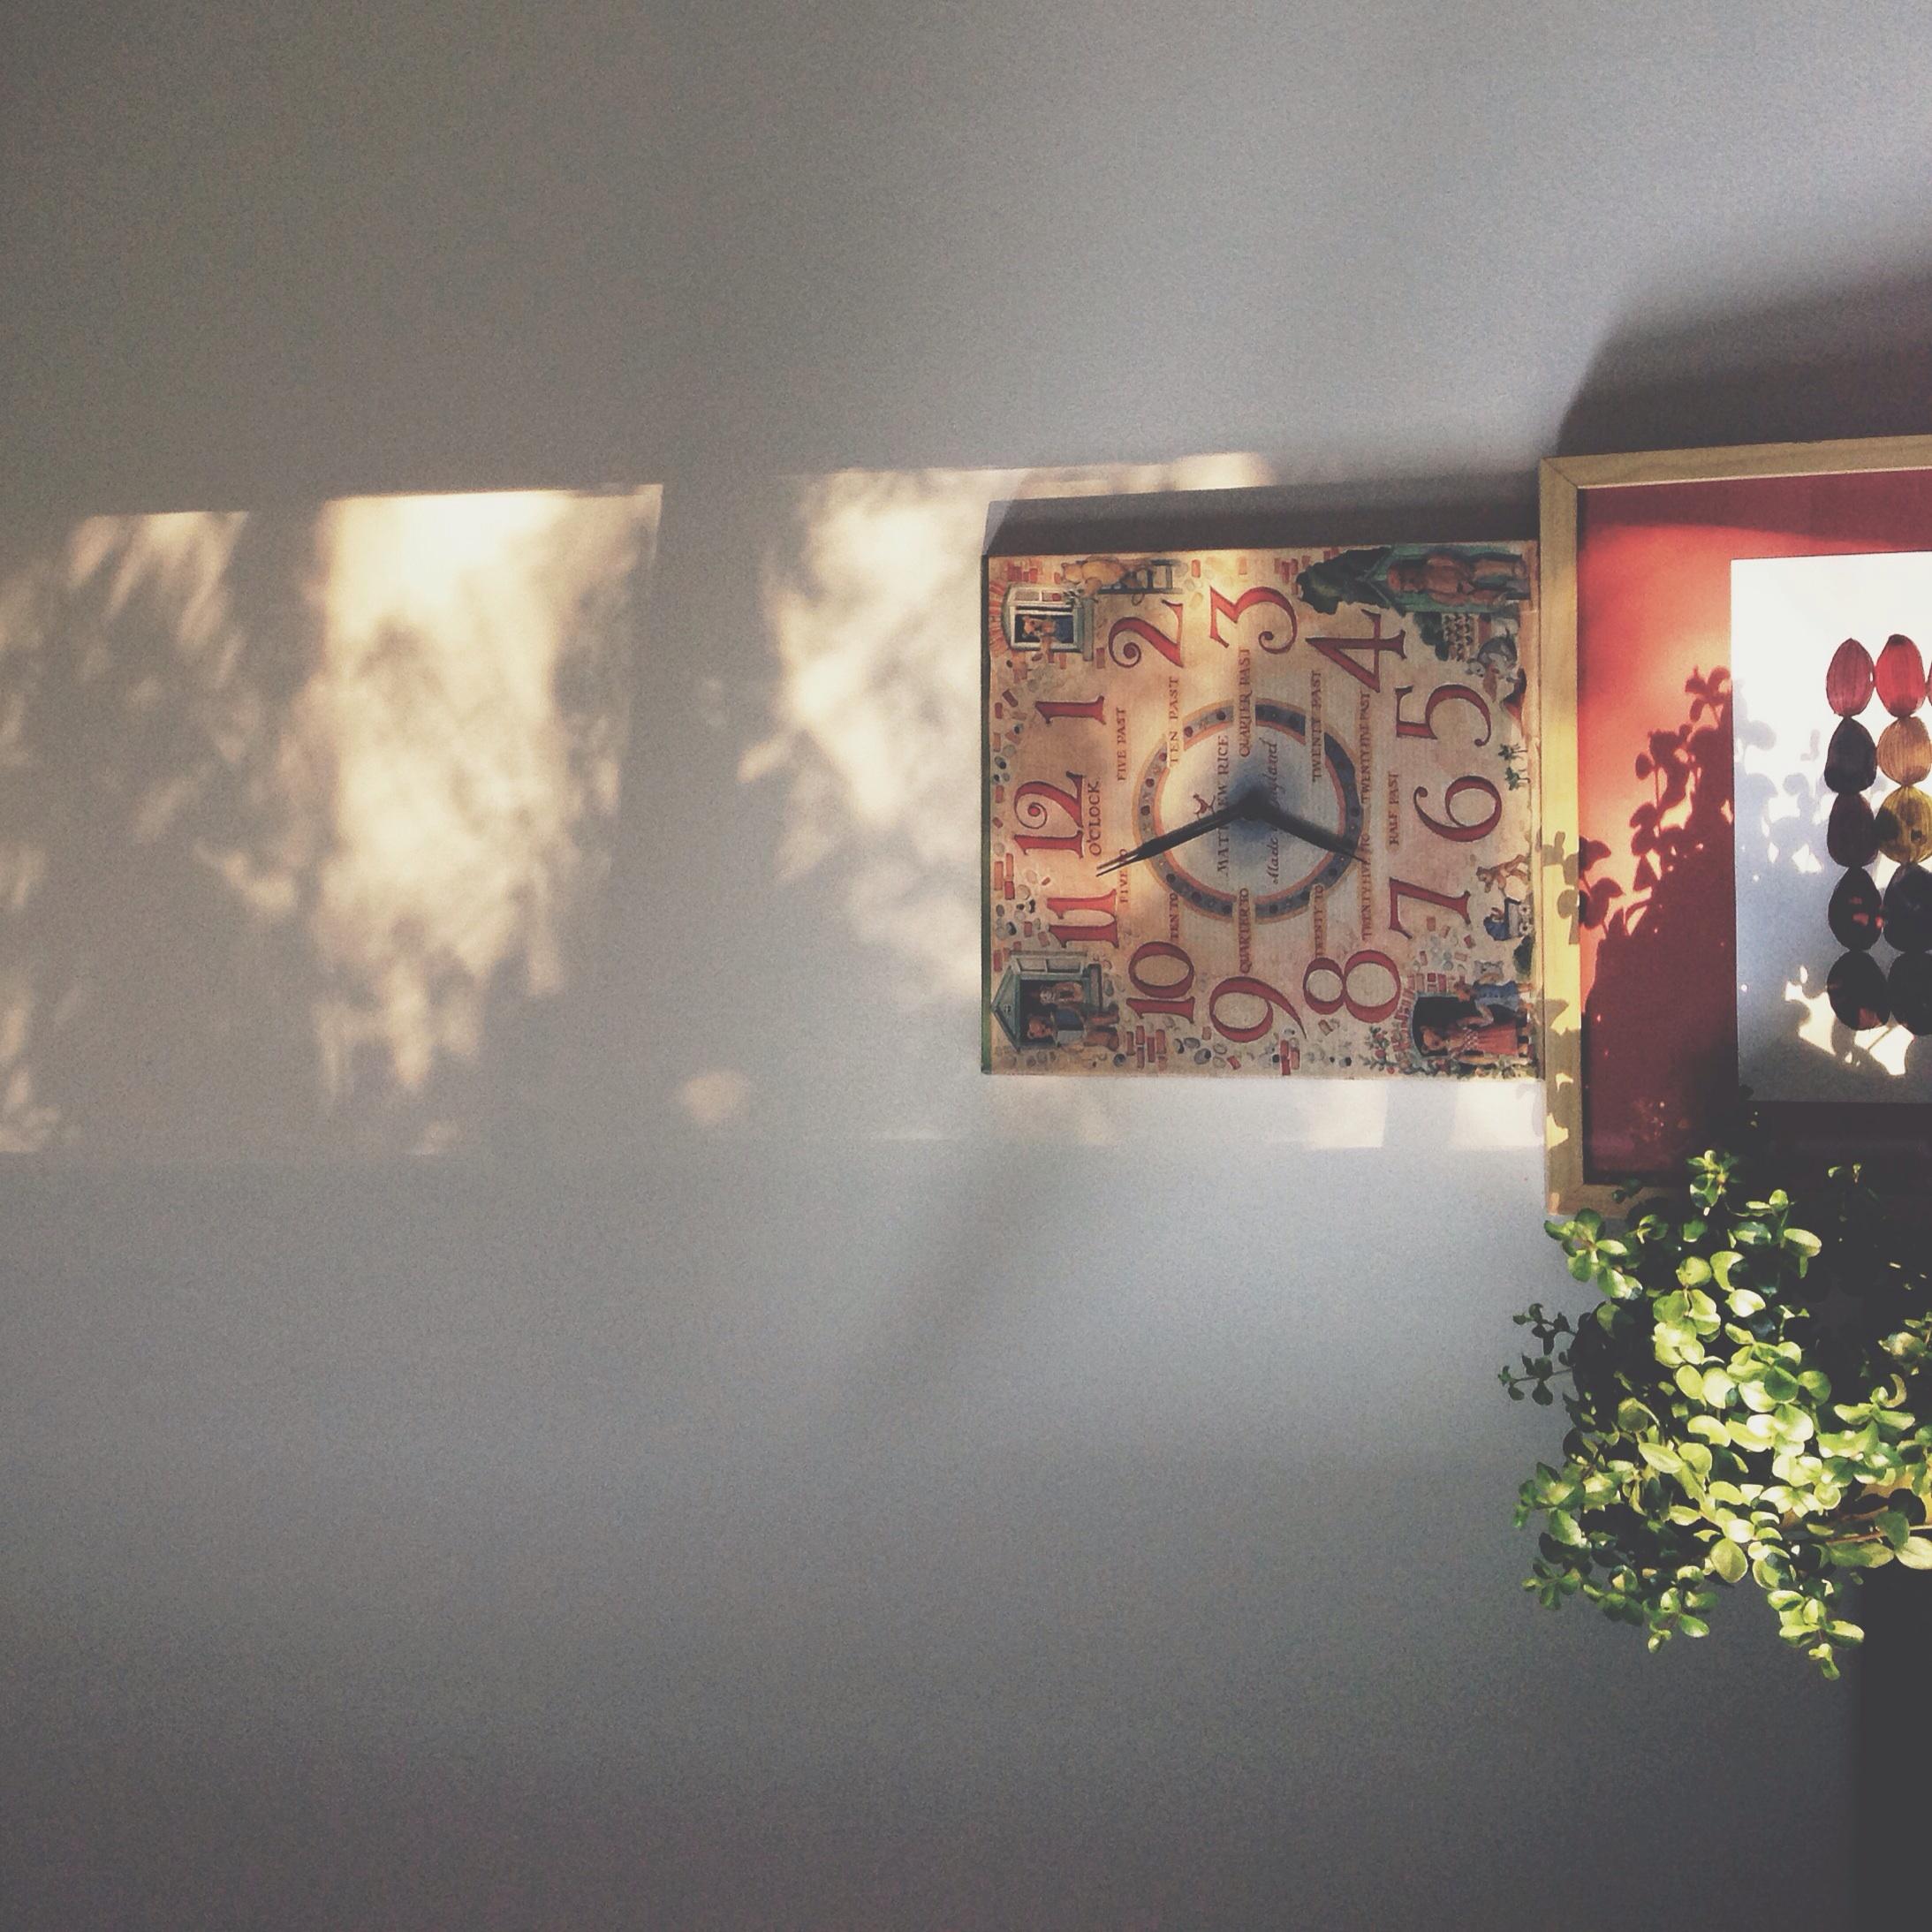 06.57 am light in my creative space - Original artwork by Tiel Sielv